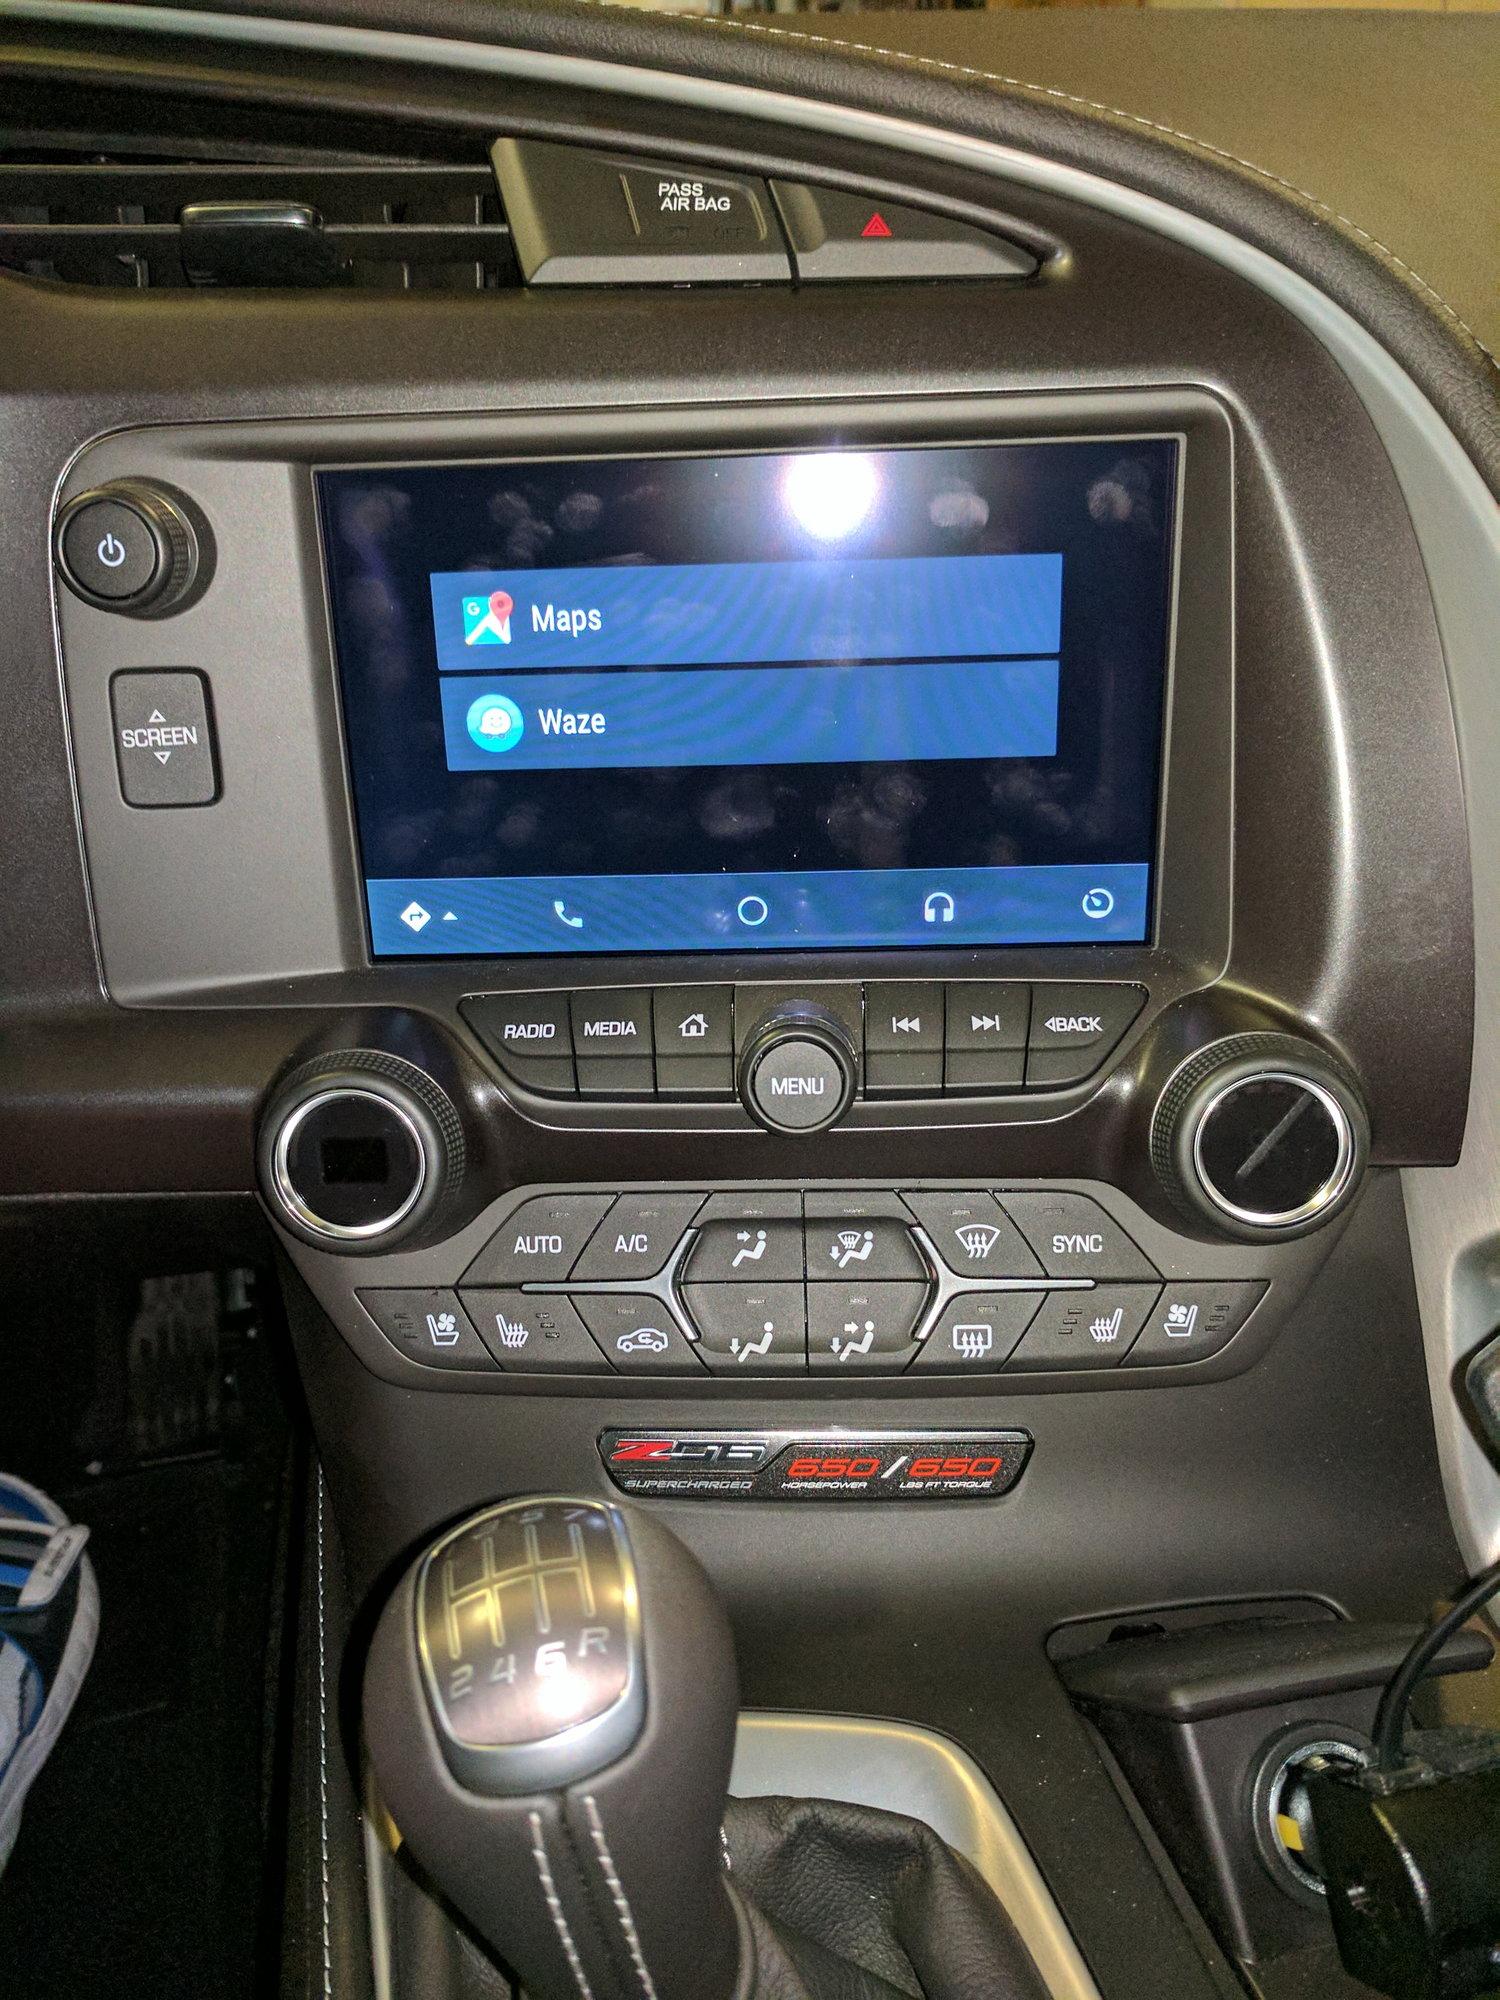 Waze Private Beta - CorvetteForum - Chevrolet Corvette Forum Discussion